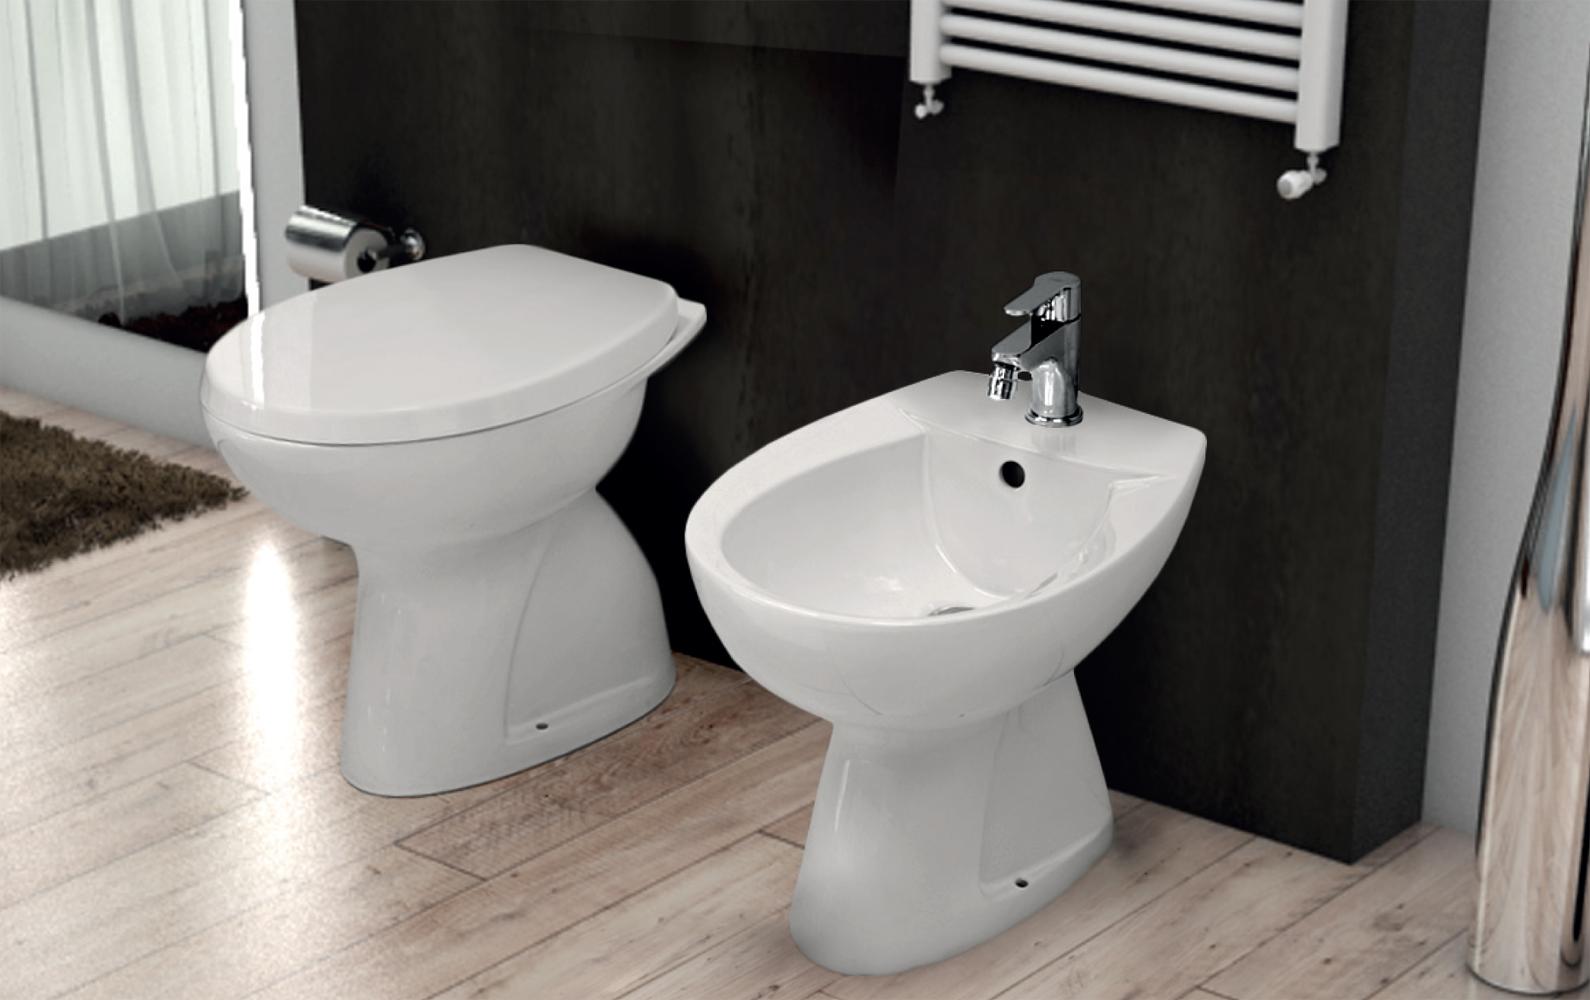 Sanitari a terra ideal standard vaso wc pavimento bidet for Bidet ideal standard